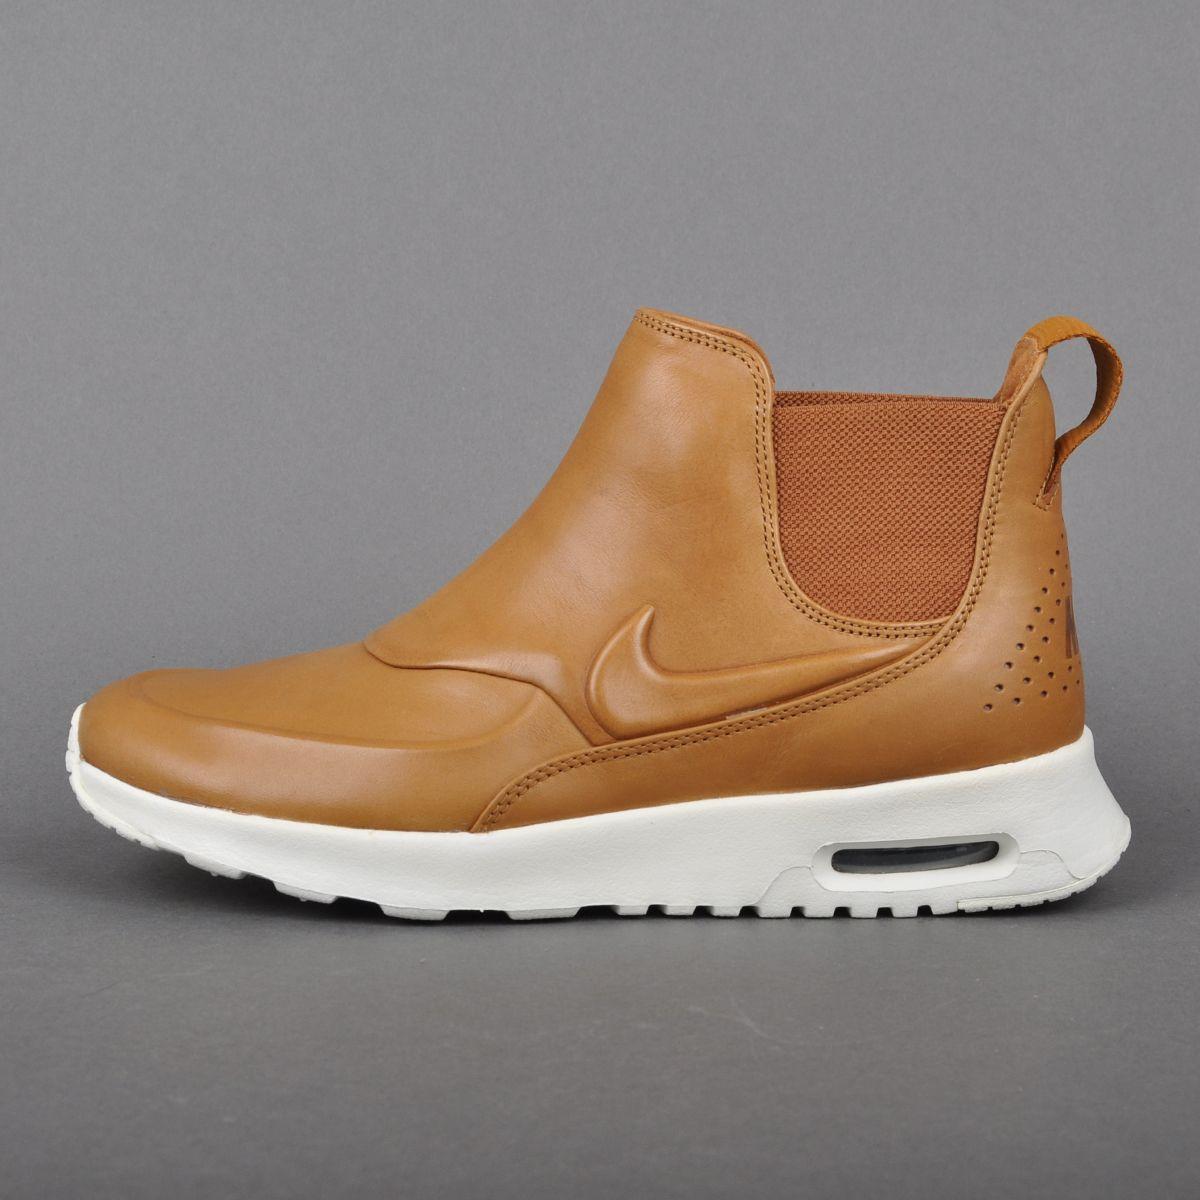 Nike Air Max Thea Mid, ale brown sail | Wooowww | Nike air